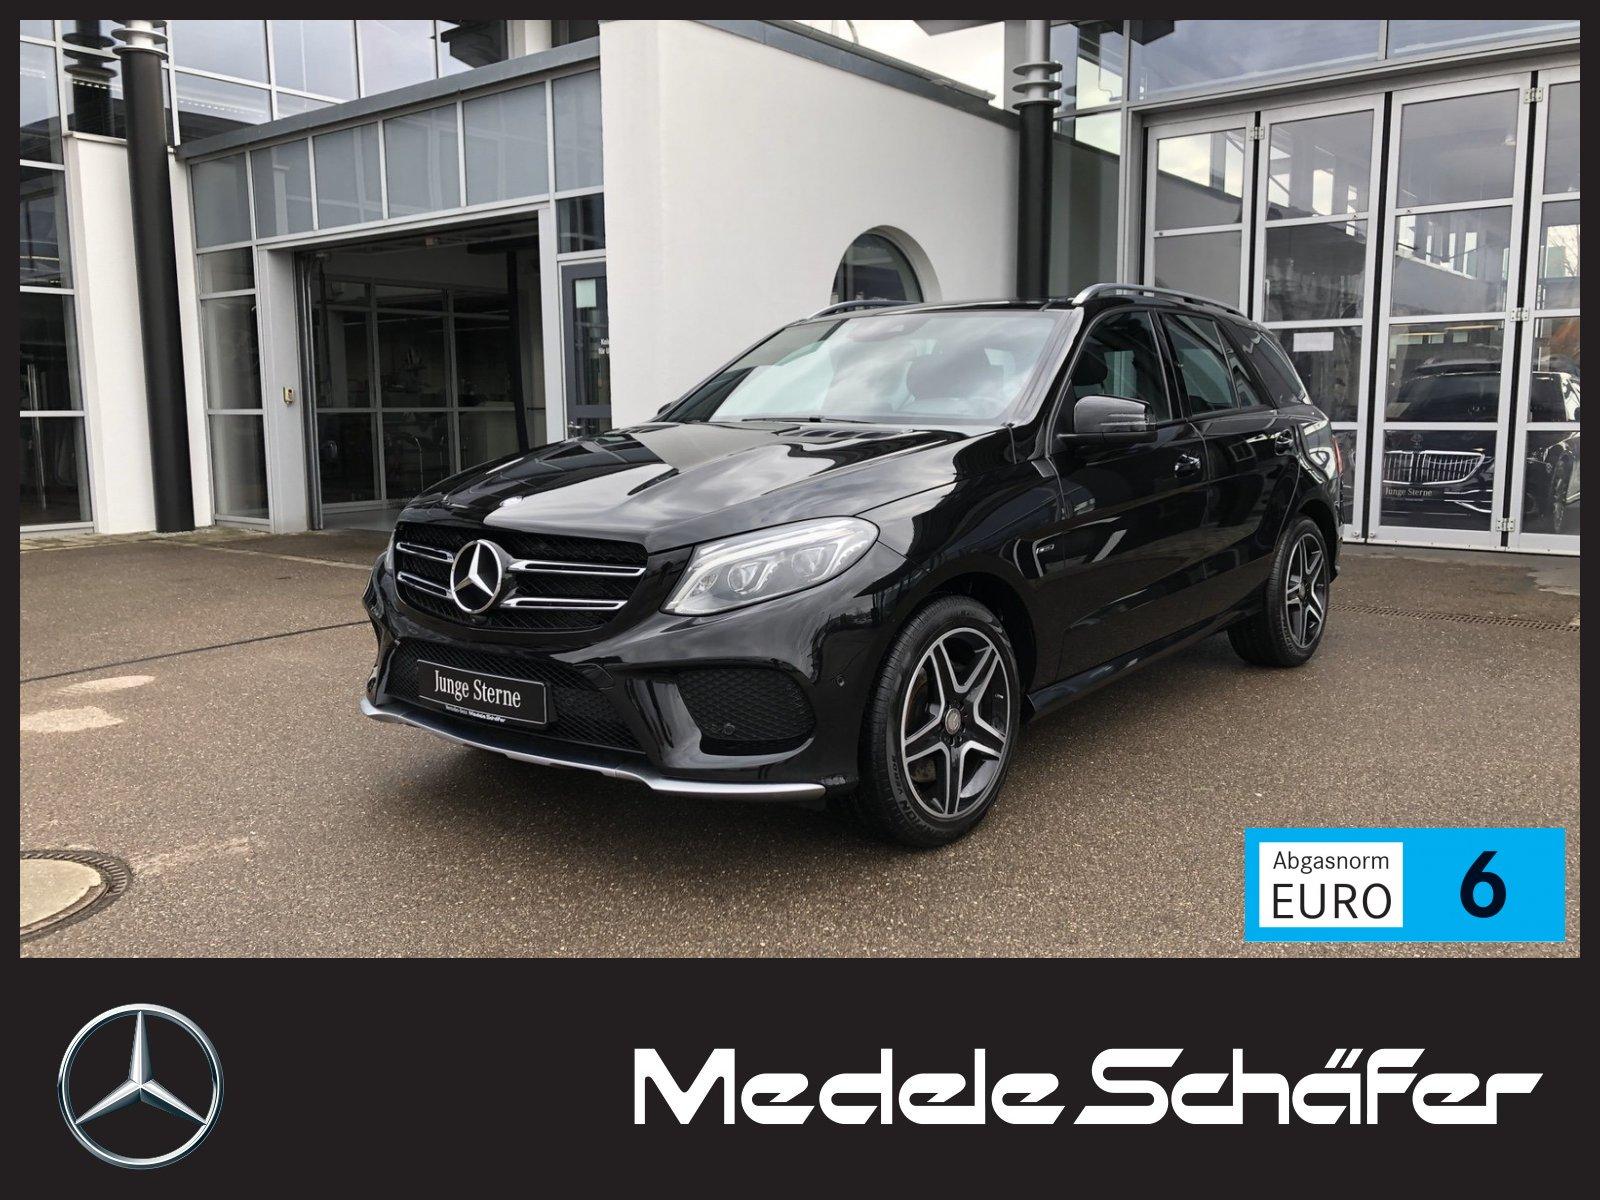 Mercedes-Benz GLE 450/43 AMG 4M 9G Pano Airm 360° AHK LED Harm, Jahr 2016, Benzin